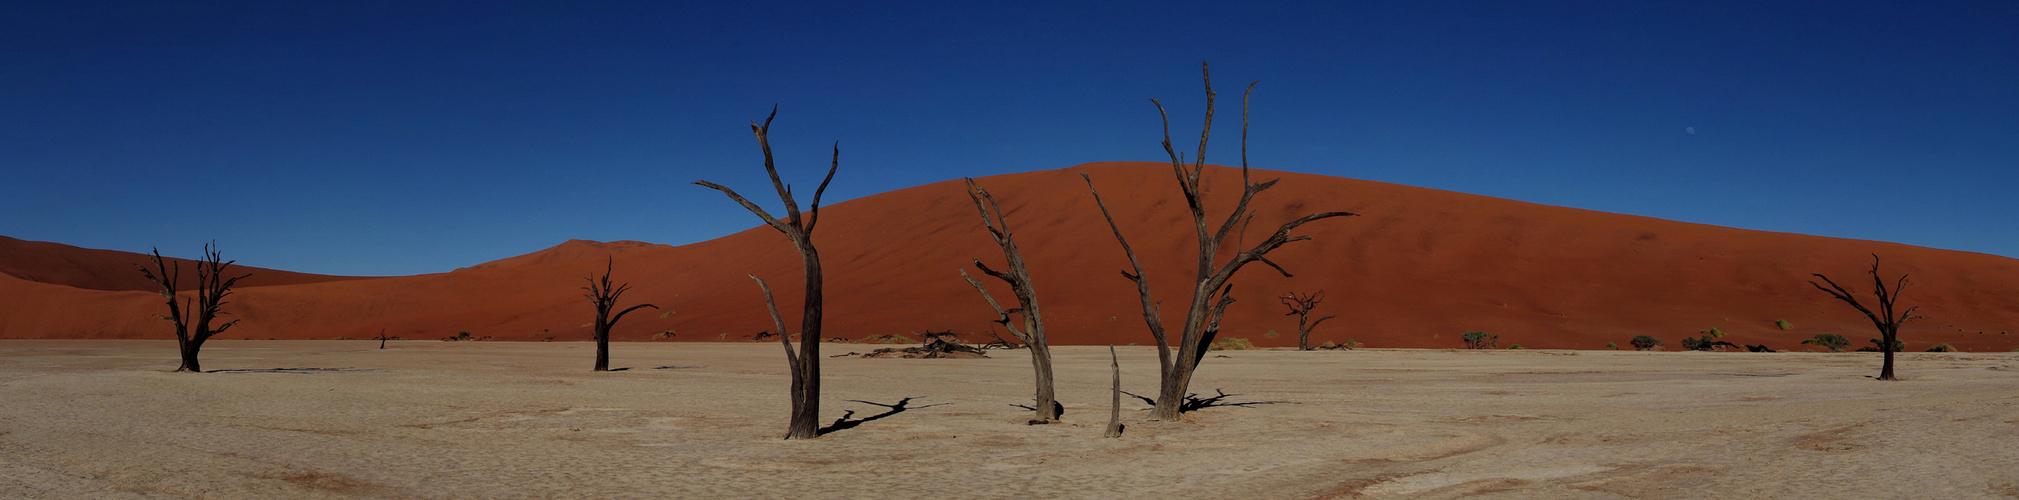 Namibia - Deadvlei - Juni 2018